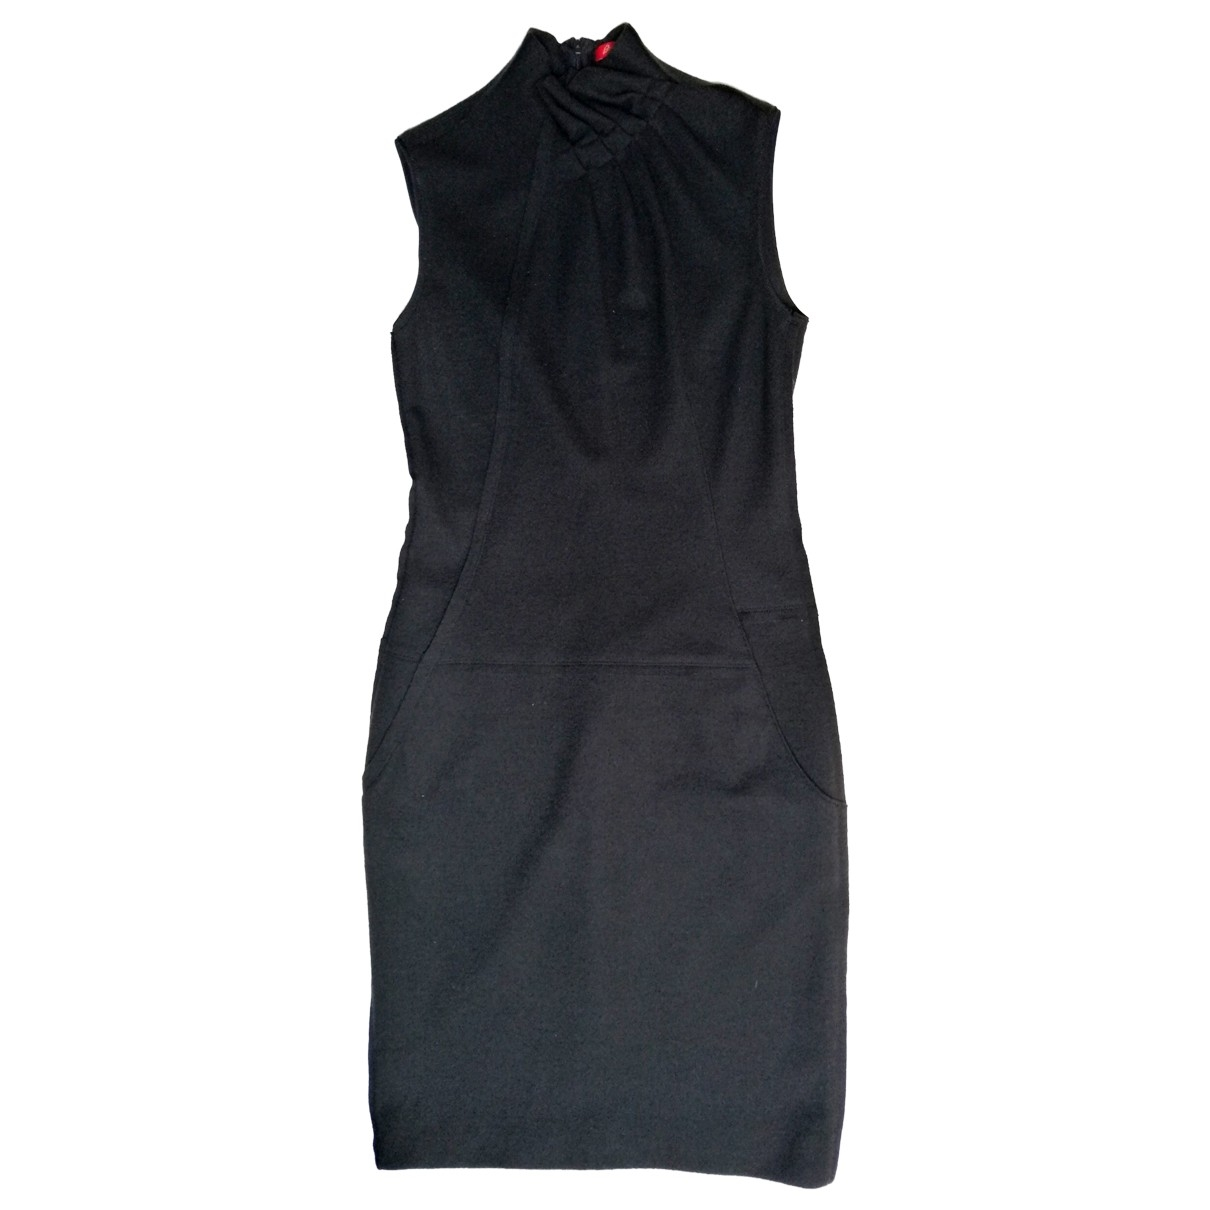 Brioni \N Kleid in  Schwarz Wolle